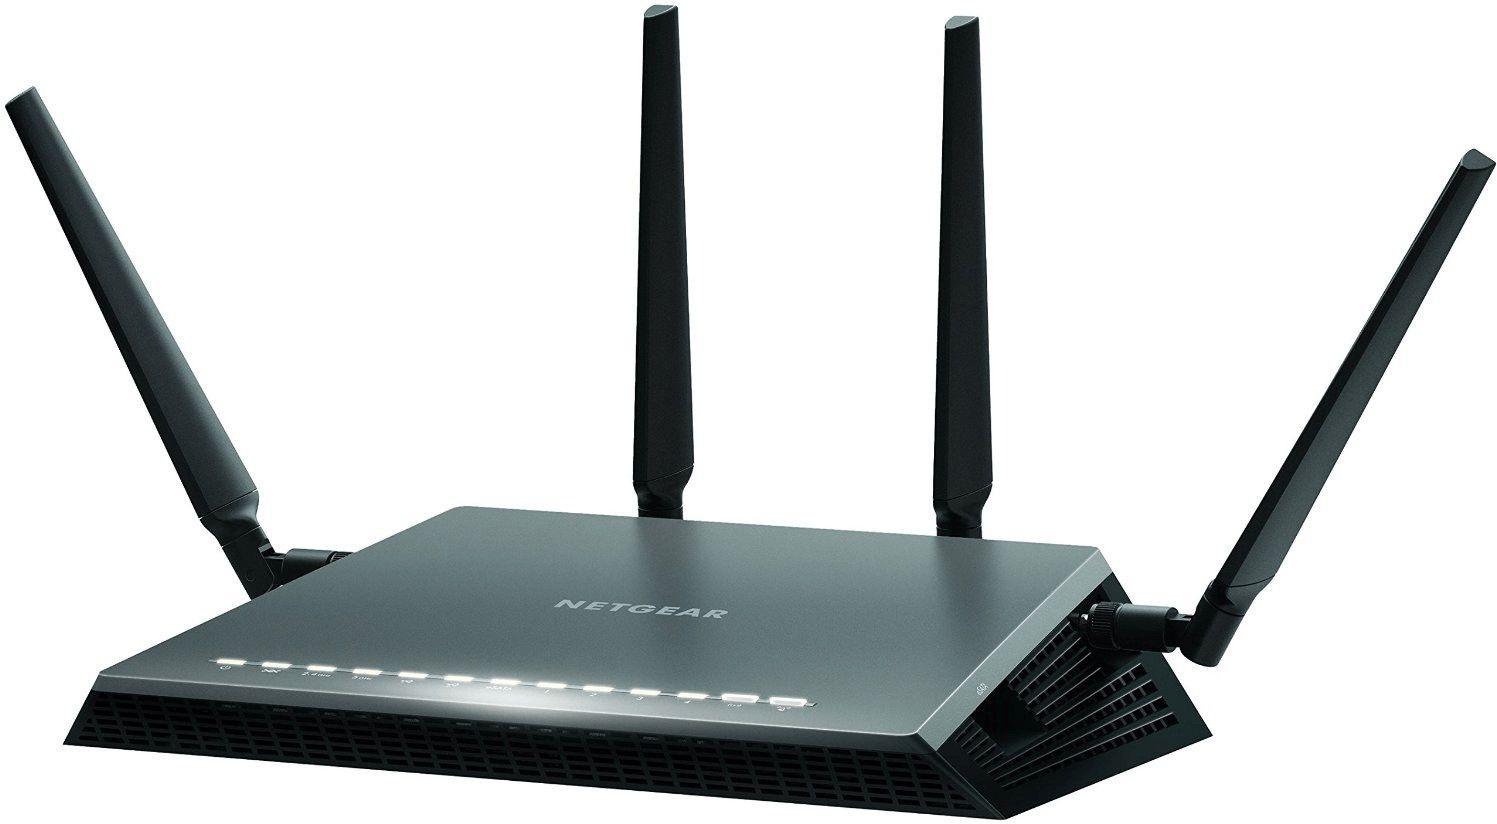 Netgear Nighthawk X4S R7800 AC2600 Gaming Router - Wireless Router AC Standard - 802.11ac [Proshop]